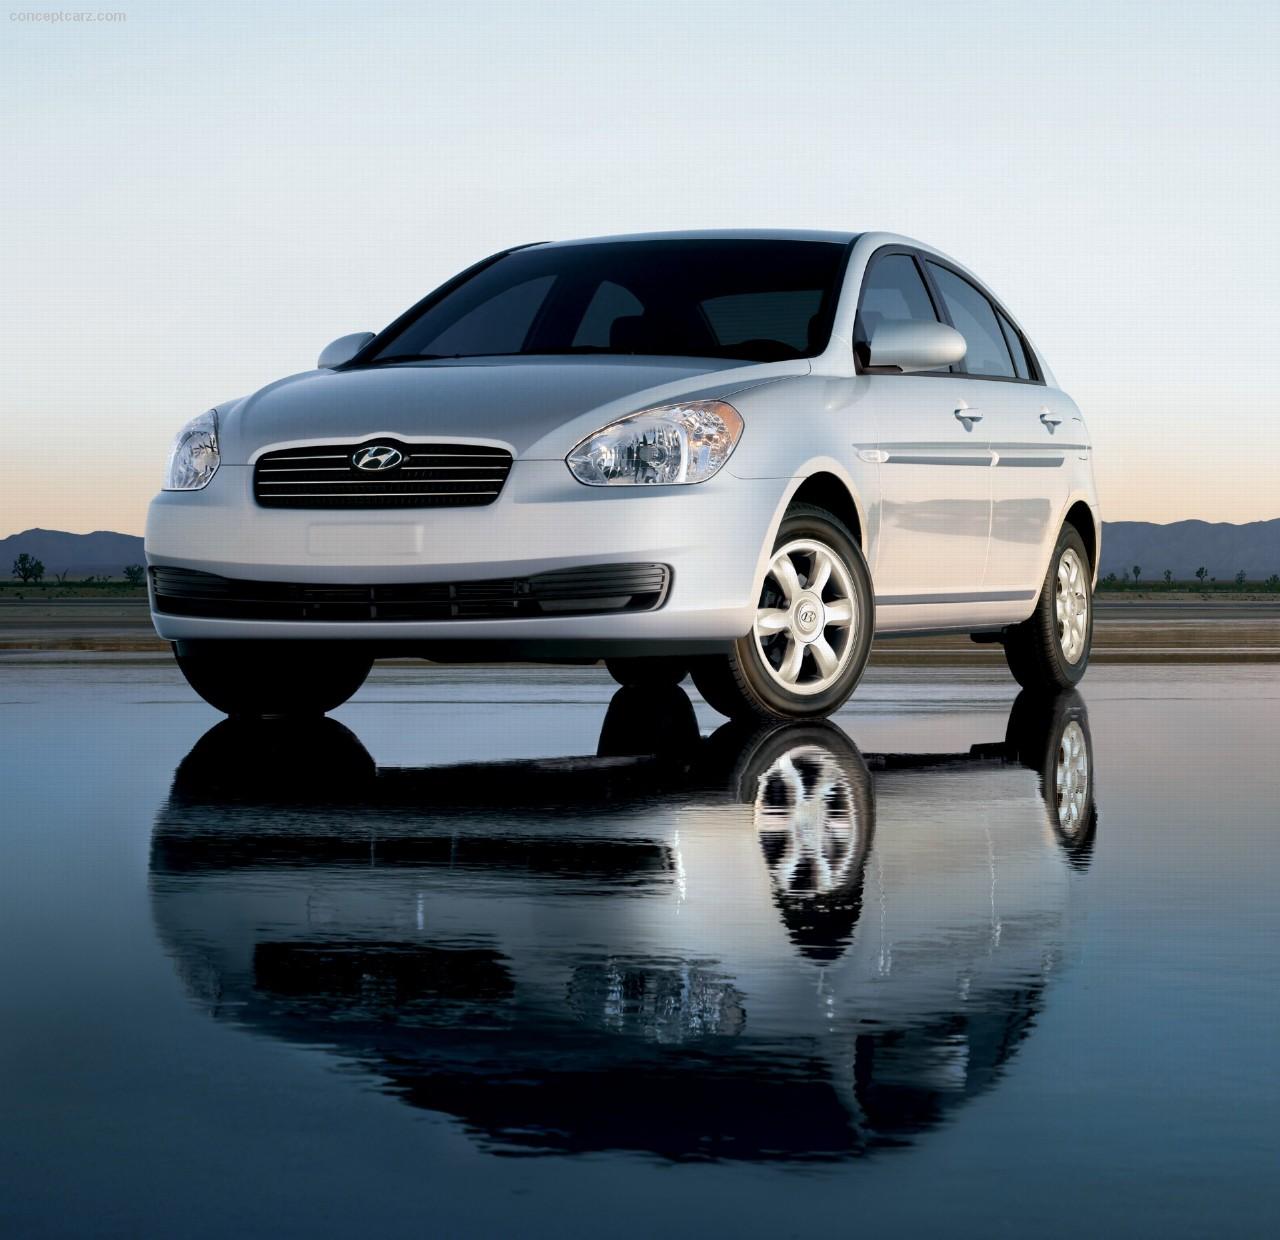 2007 Hyundai Accent GLS Desktop Wallpaper And High